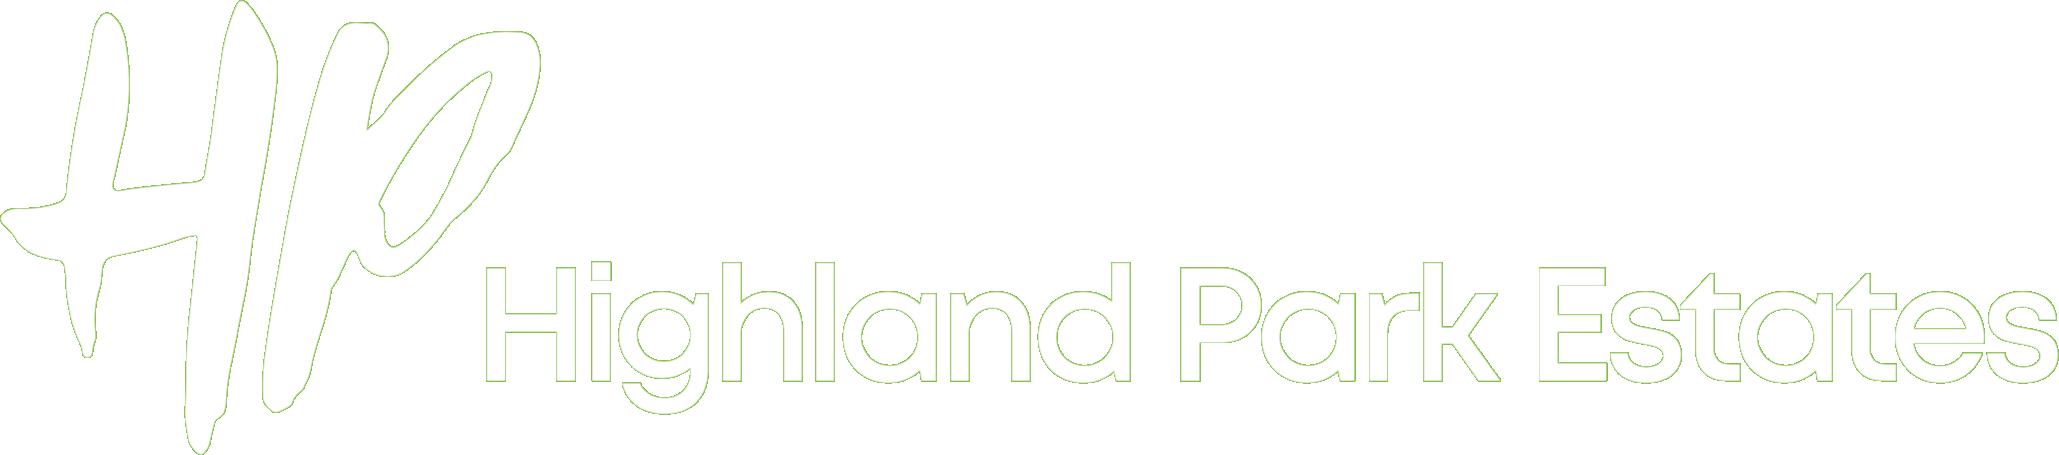 Highland Park Estates